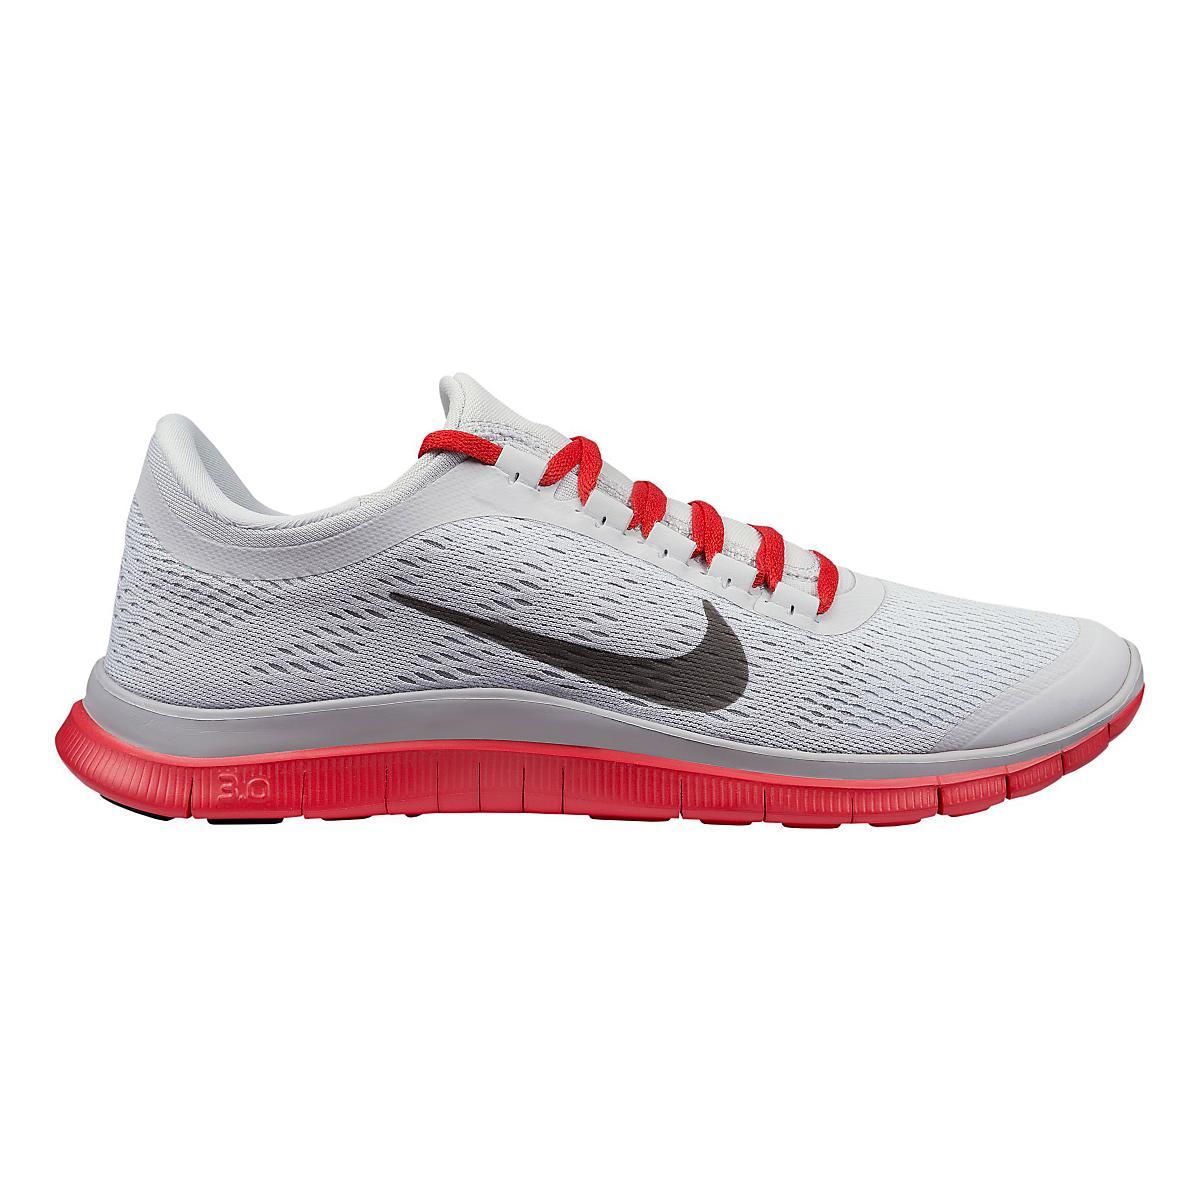 6f3f1a653cf Mens Nike Free 3.0 v5 Running Shoe at Road Runner Sports